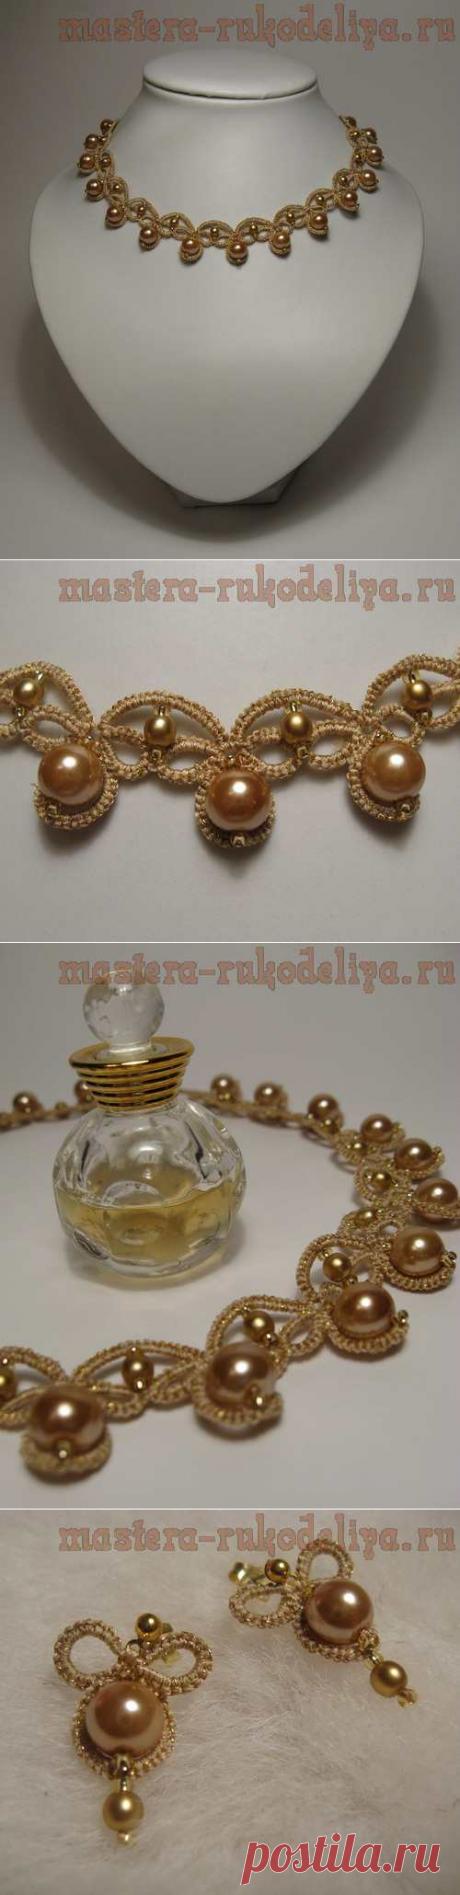 """Марлен&quot necklace; - Nebka.Ru"